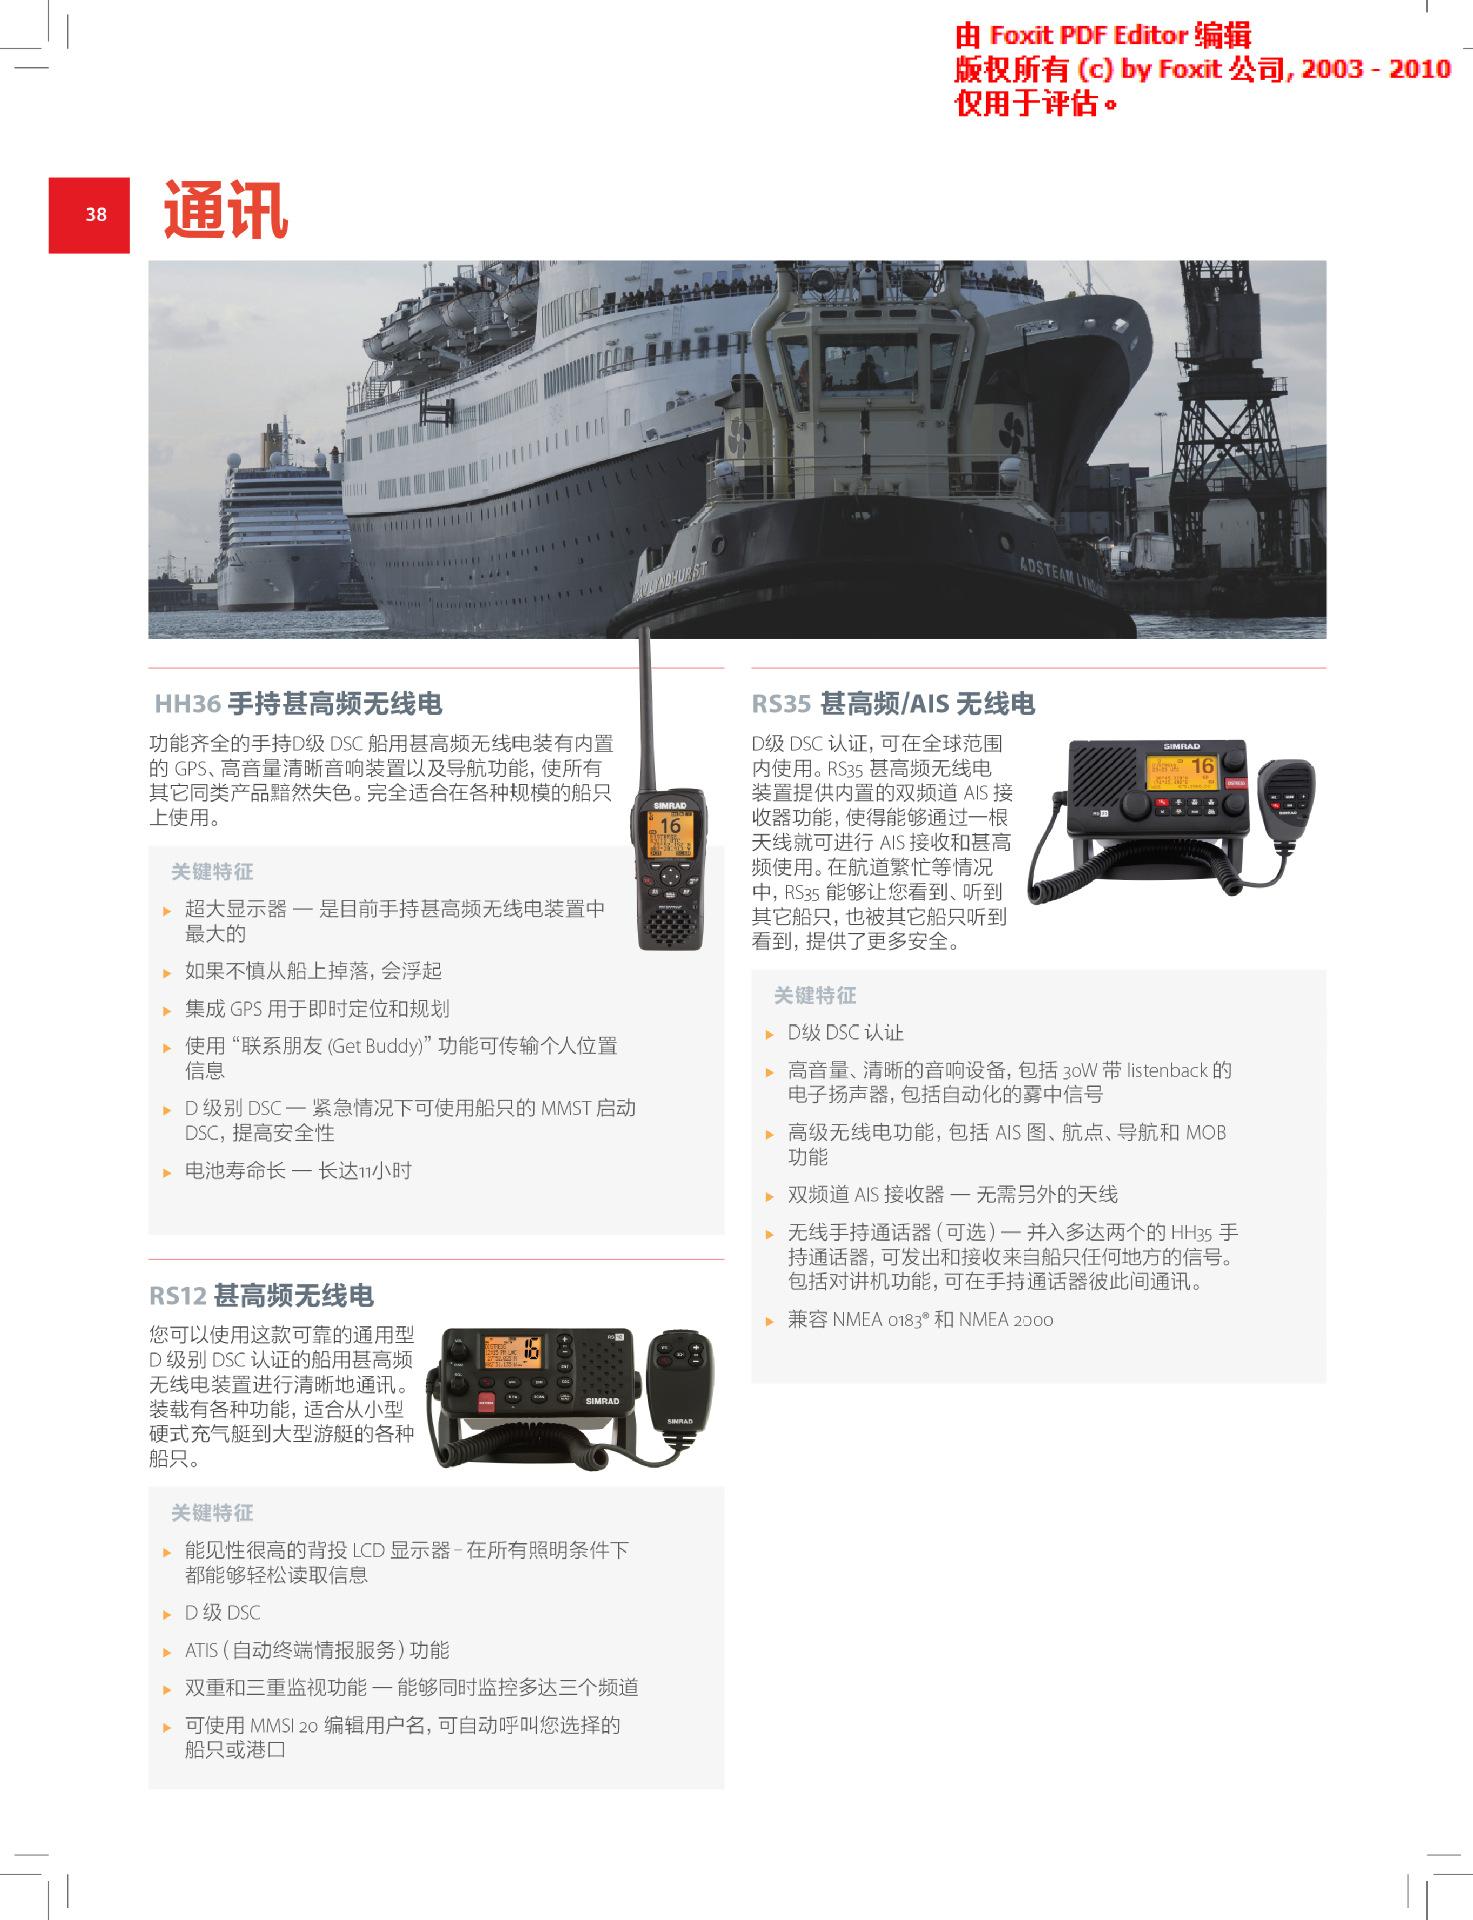 商船導航解決方案SimradPro2014_CHINESE_